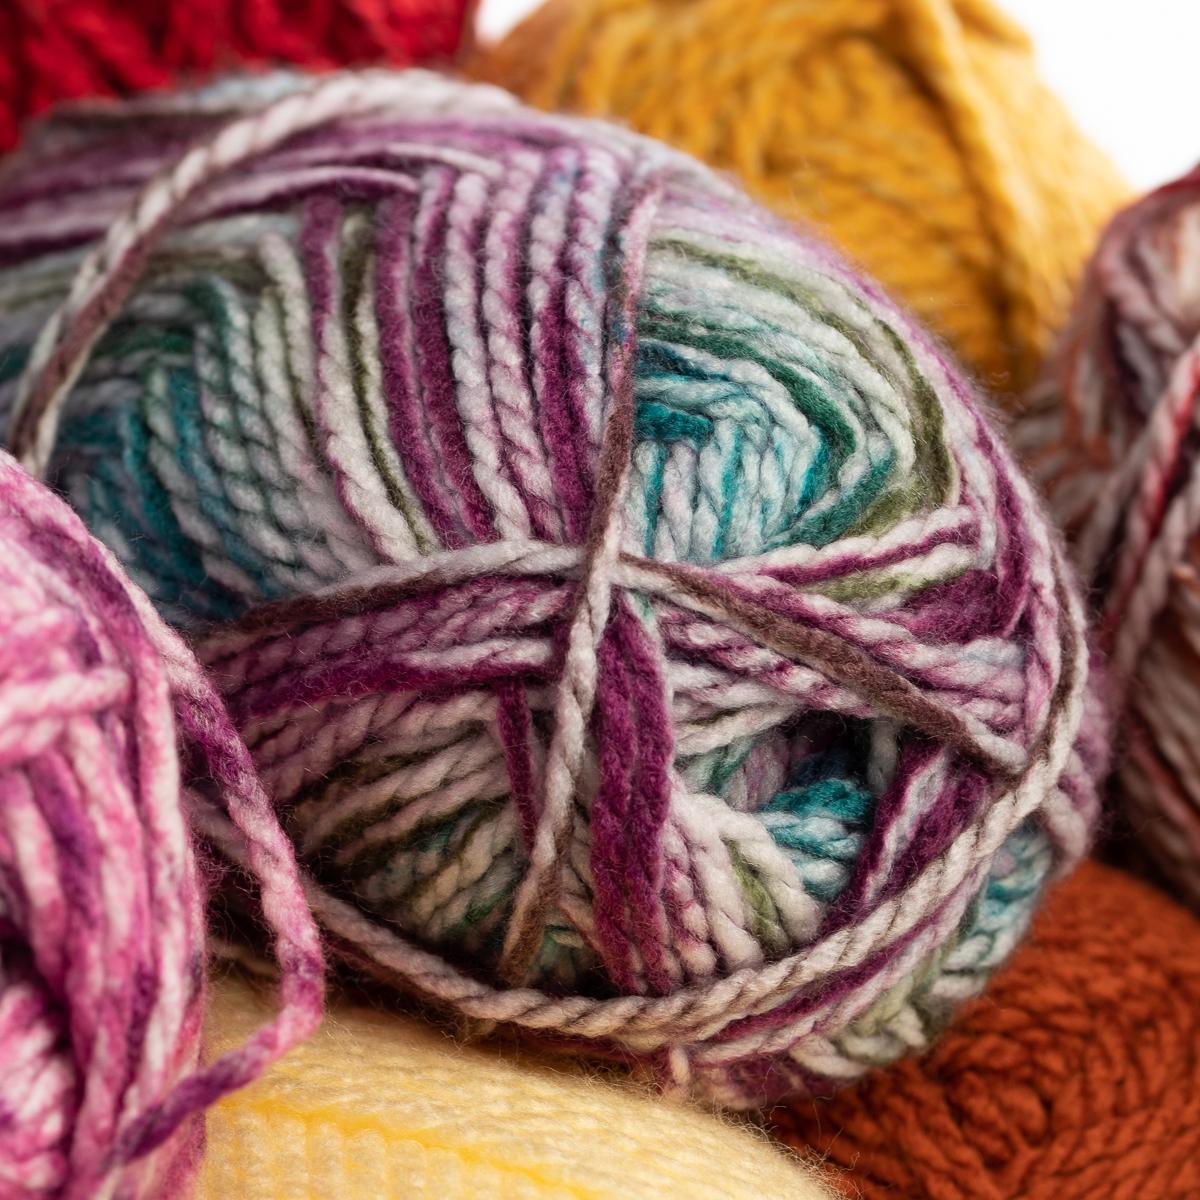 3pk-Premier-Yarns-Deborah-Norville-Serenity-100-Acrylic-Yarn-Chunky-5-Knitting thumbnail 29